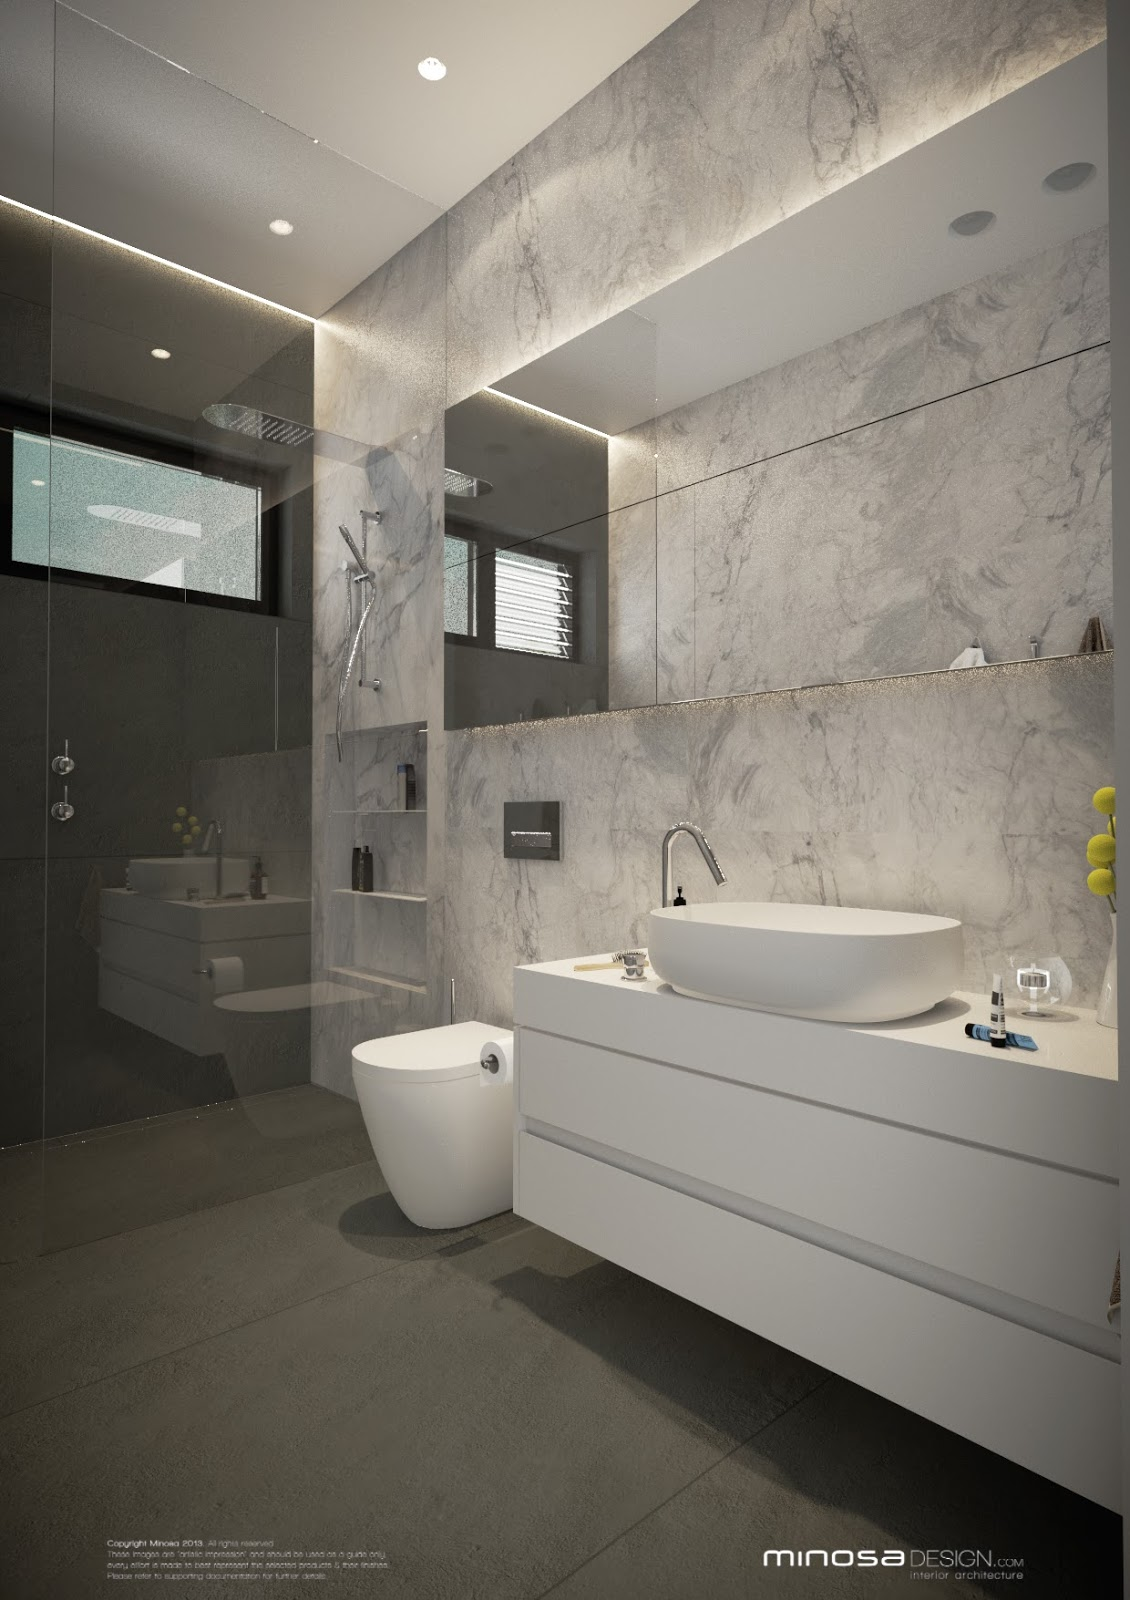 Minosa: Modern Monochrome Bathroom Design on Monochromatic Bathroom Ideas  id=23406